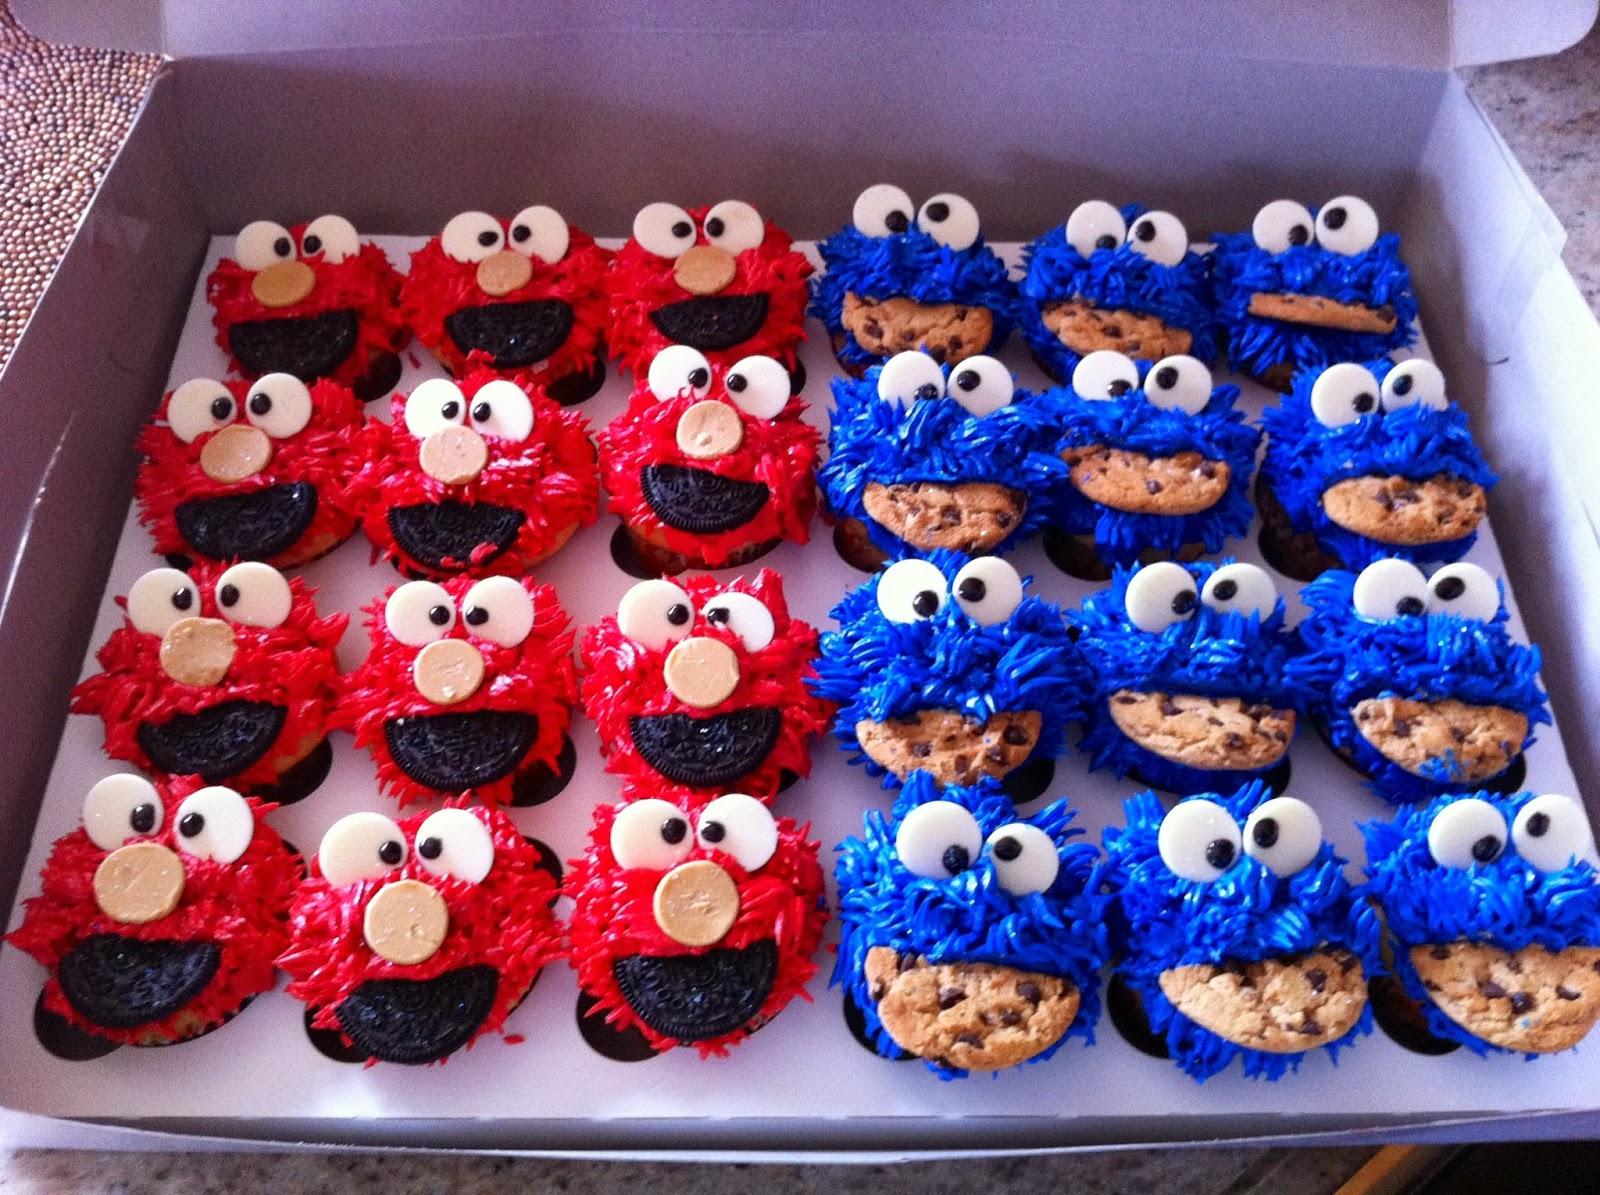 Veronicakes Newport Beach: Elmo x Cookie Monster Cupcakes